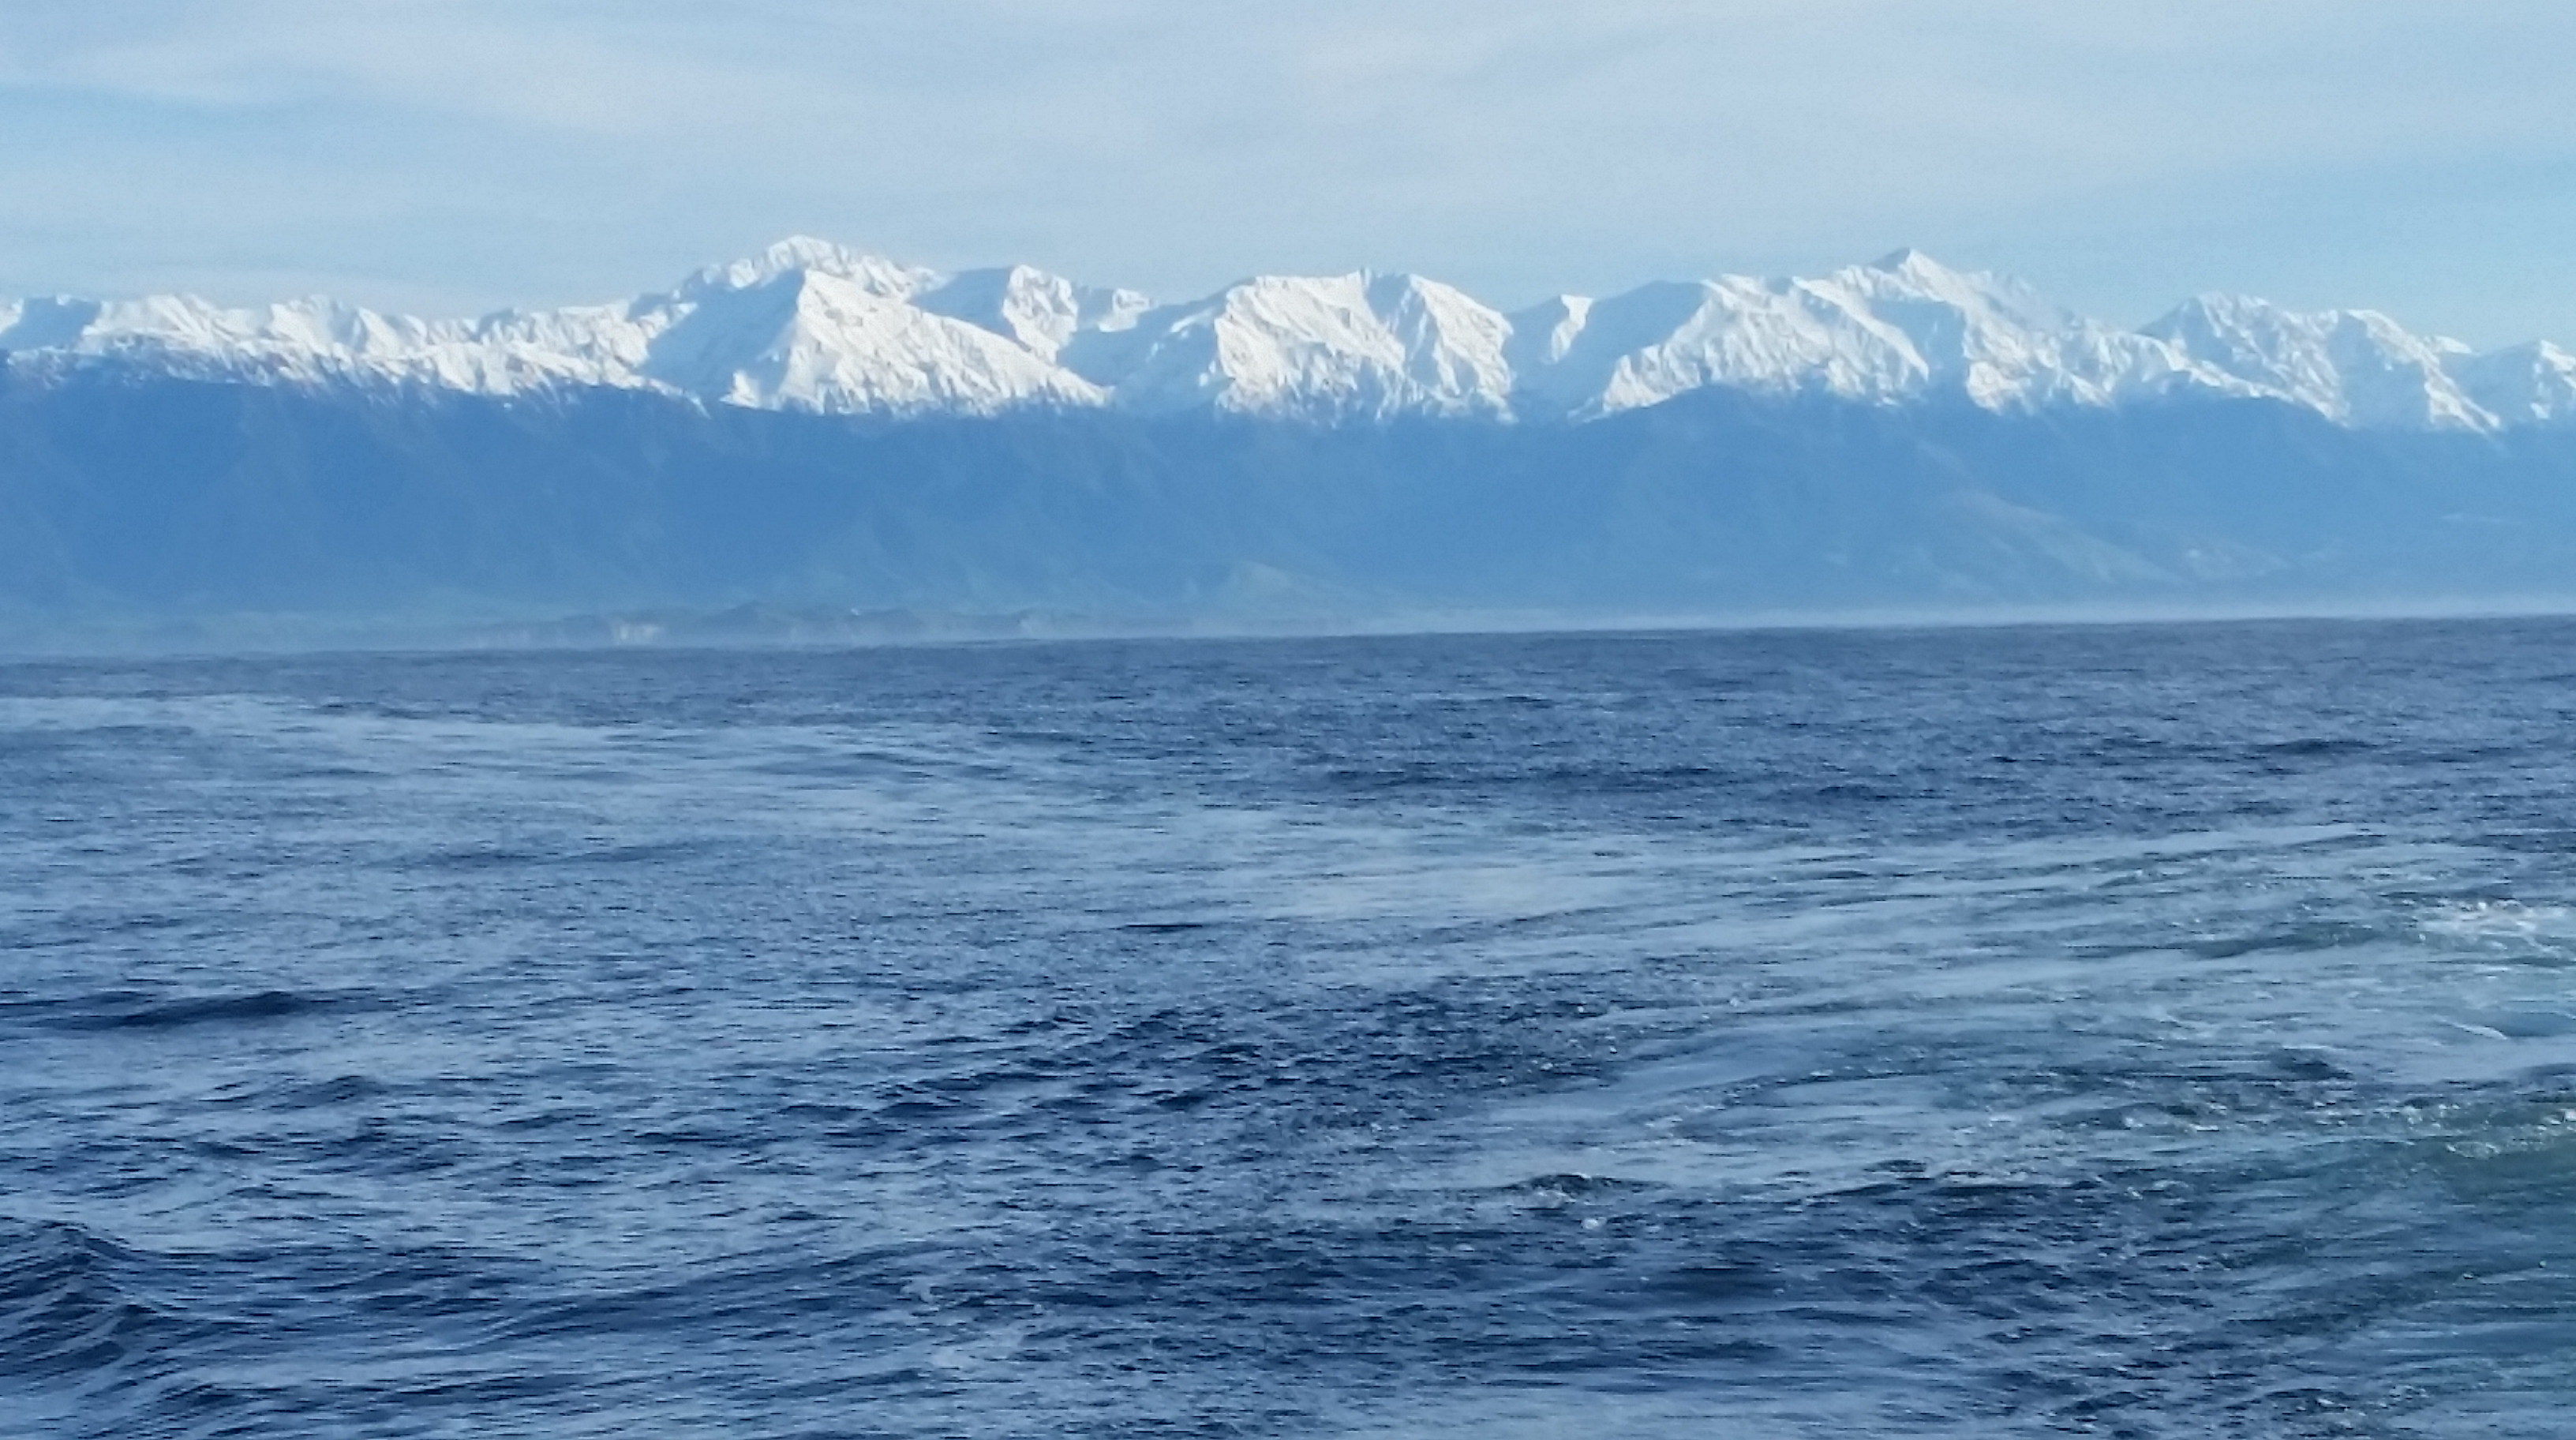 Ocean and Mountains from sea Kaikoura 2017